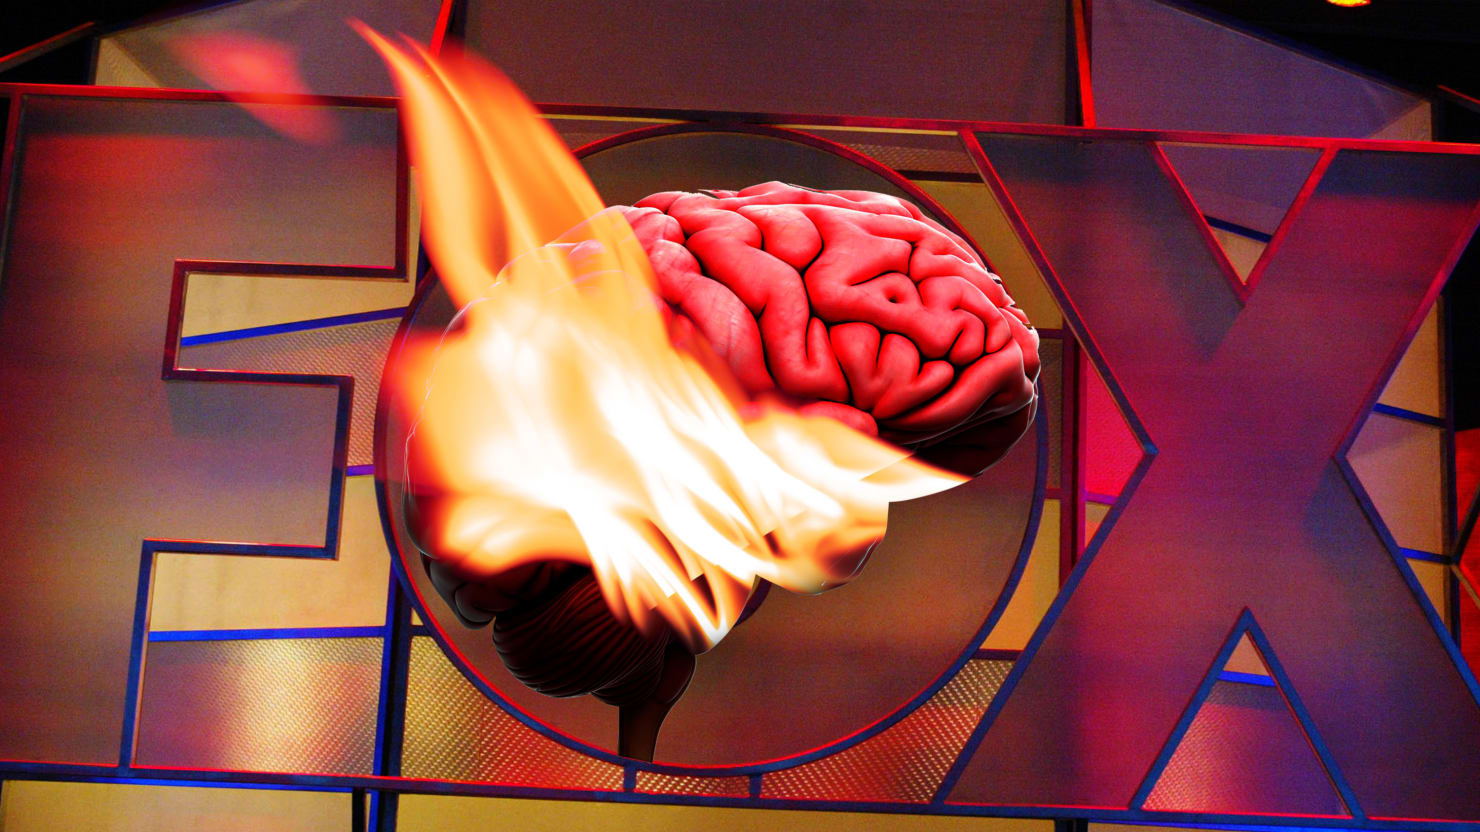 Fox News Lobotomizes Its Brain Room, Cuts Fact-Based...